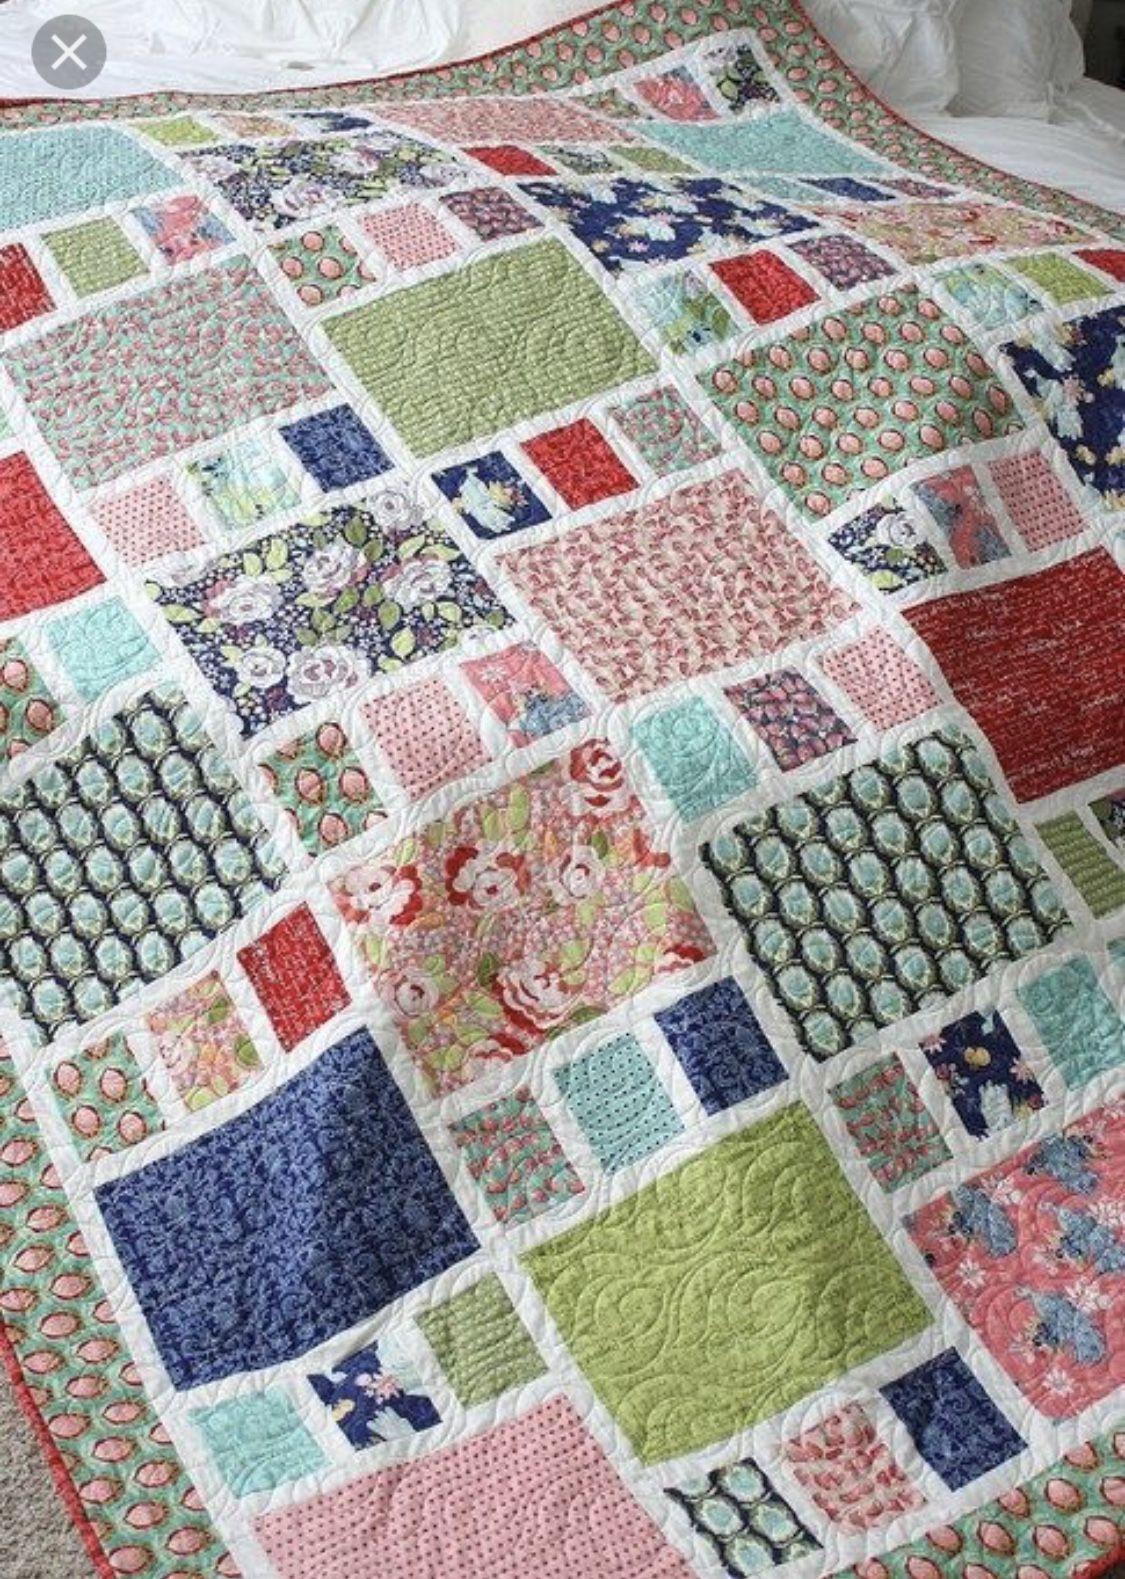 Free Big Block Quilt Patterns Best Design Inspiration